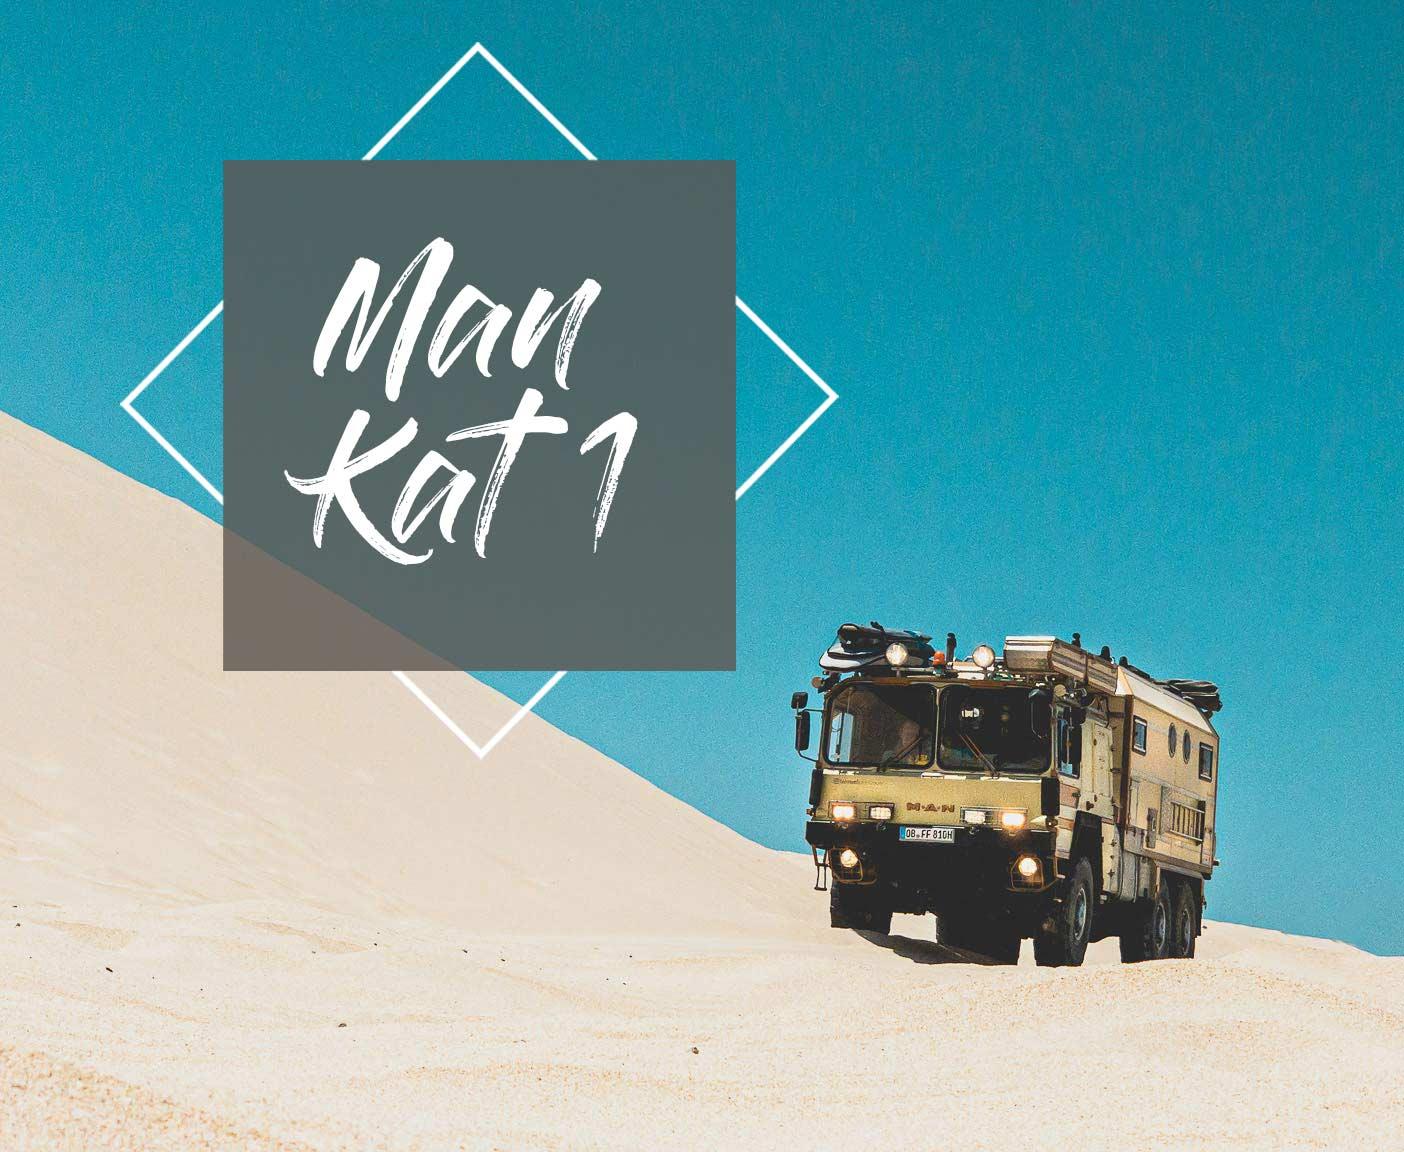 man-kat-1_expeditionsmobil_wohnmobil-kaufen_ersatzteile